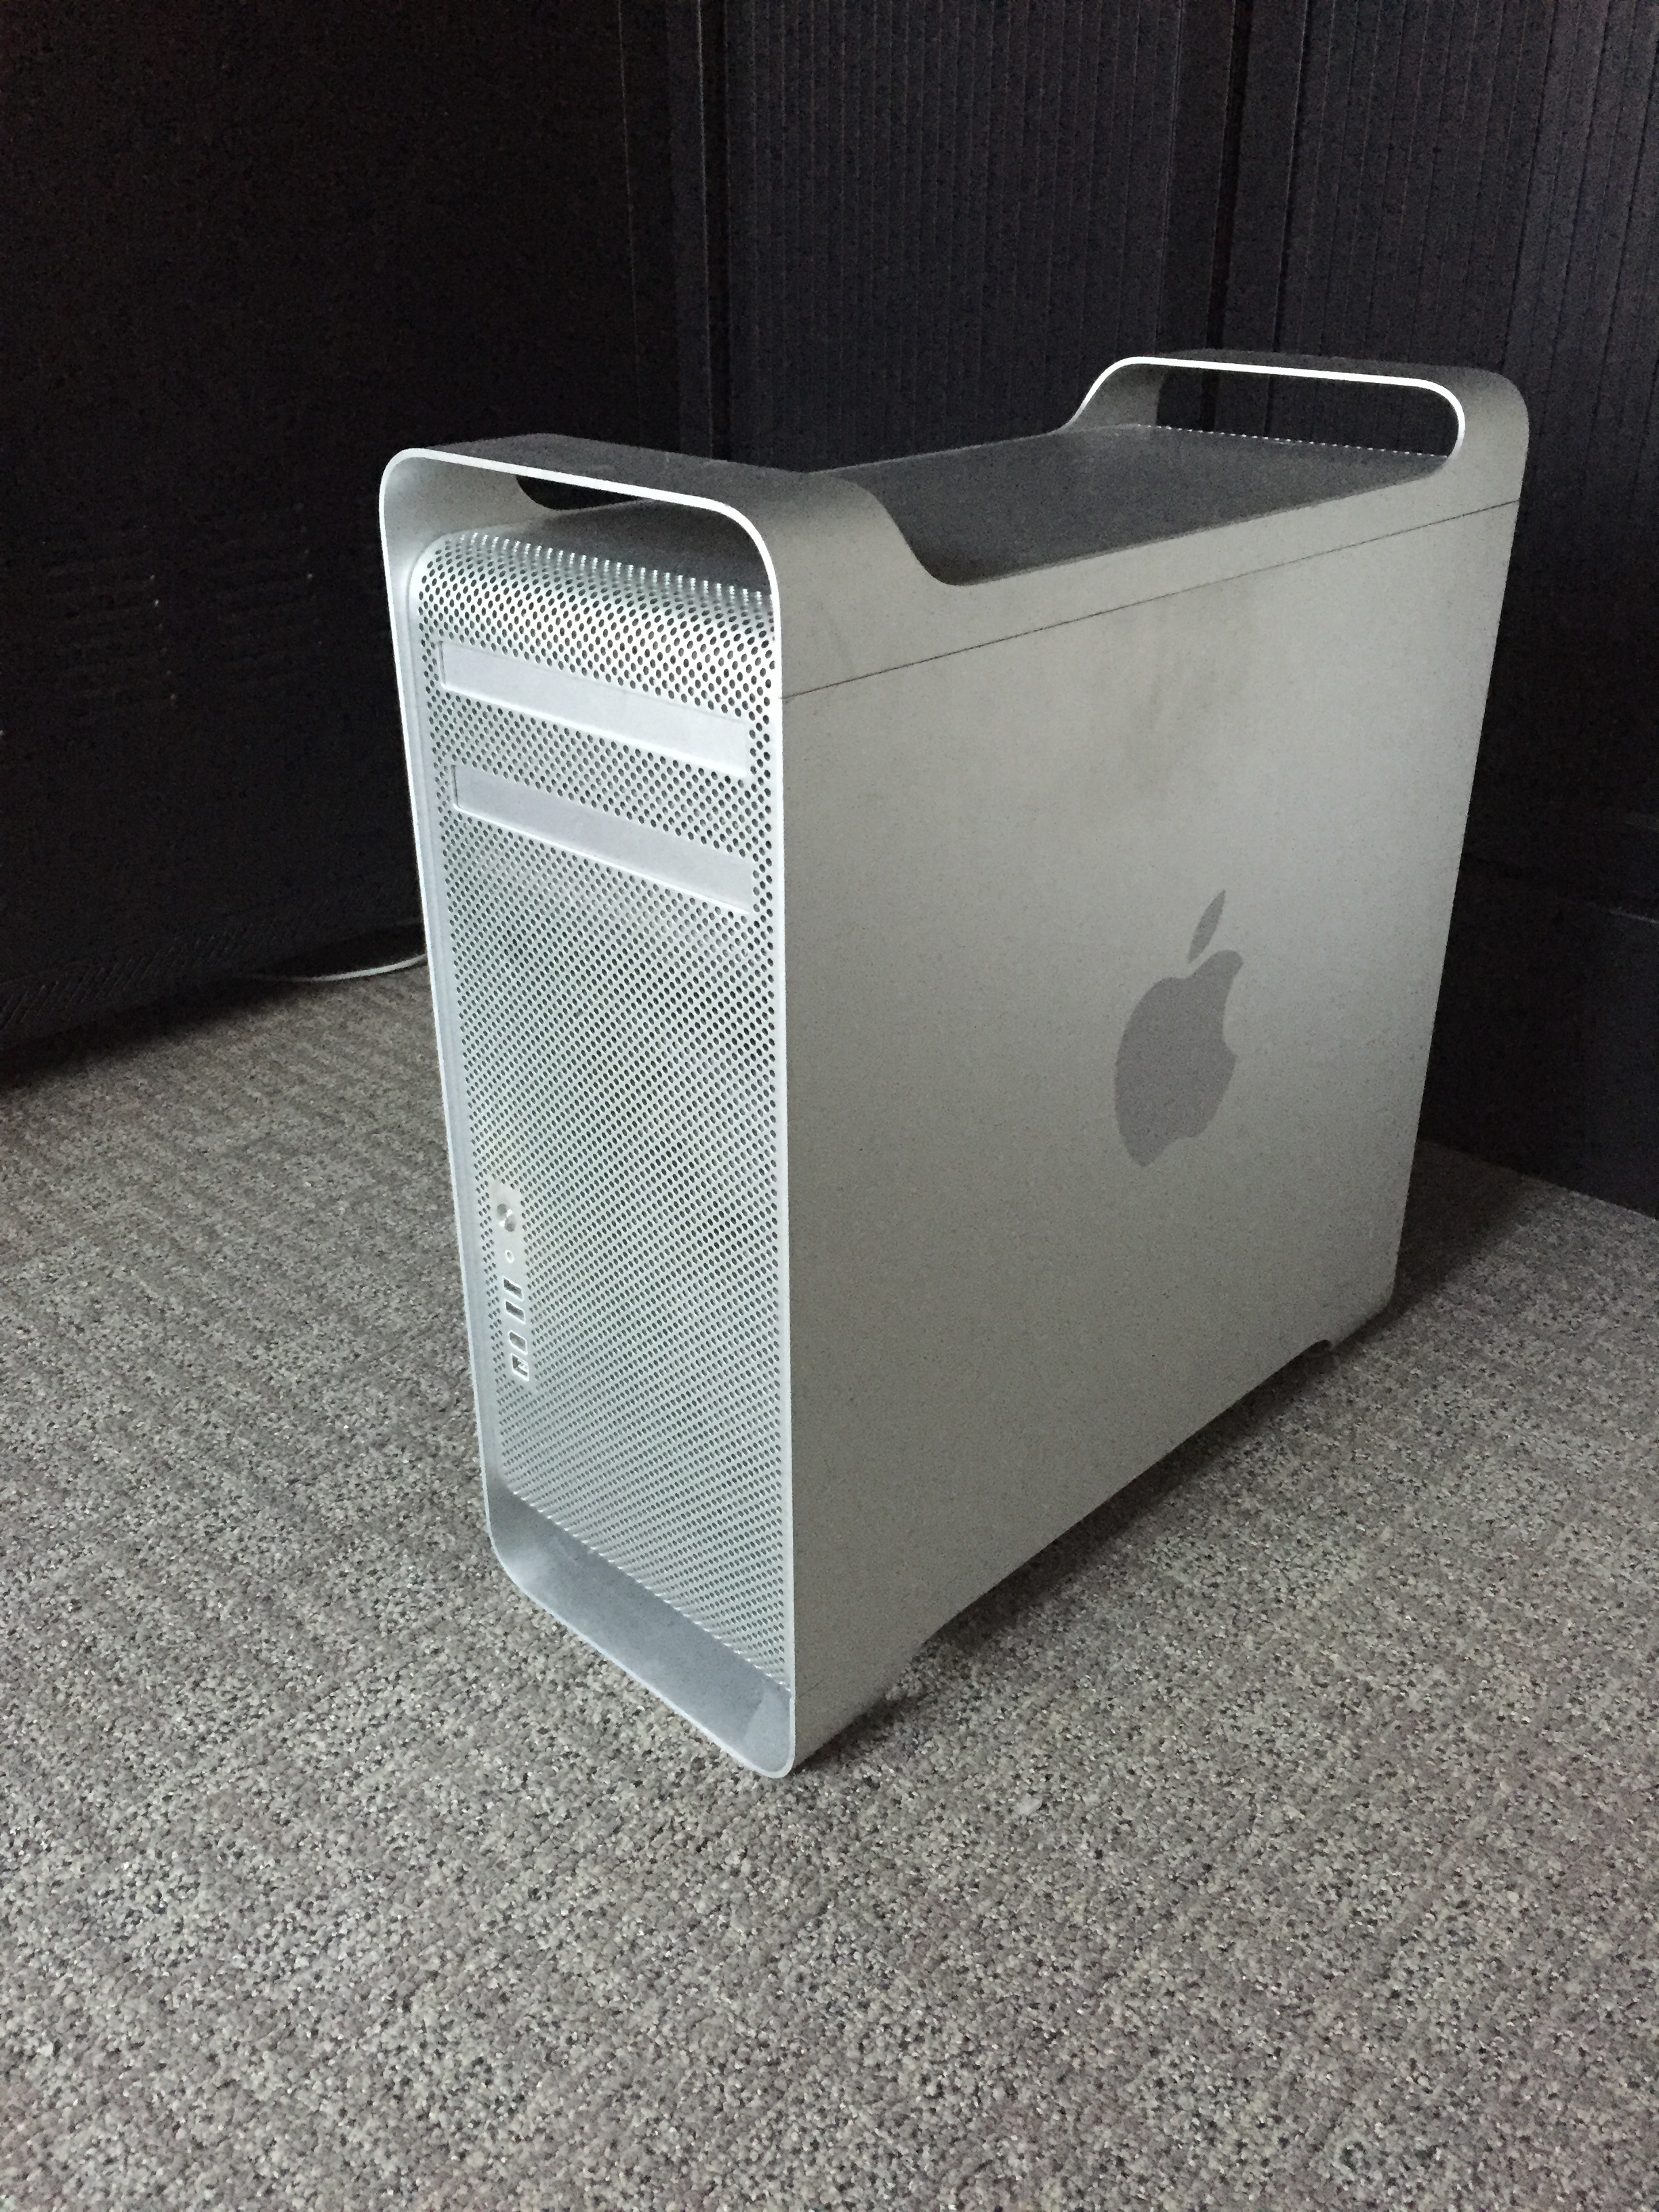 Apple Mac Pro 1,1 – € 595.00 – ( Upgraded Video Card )